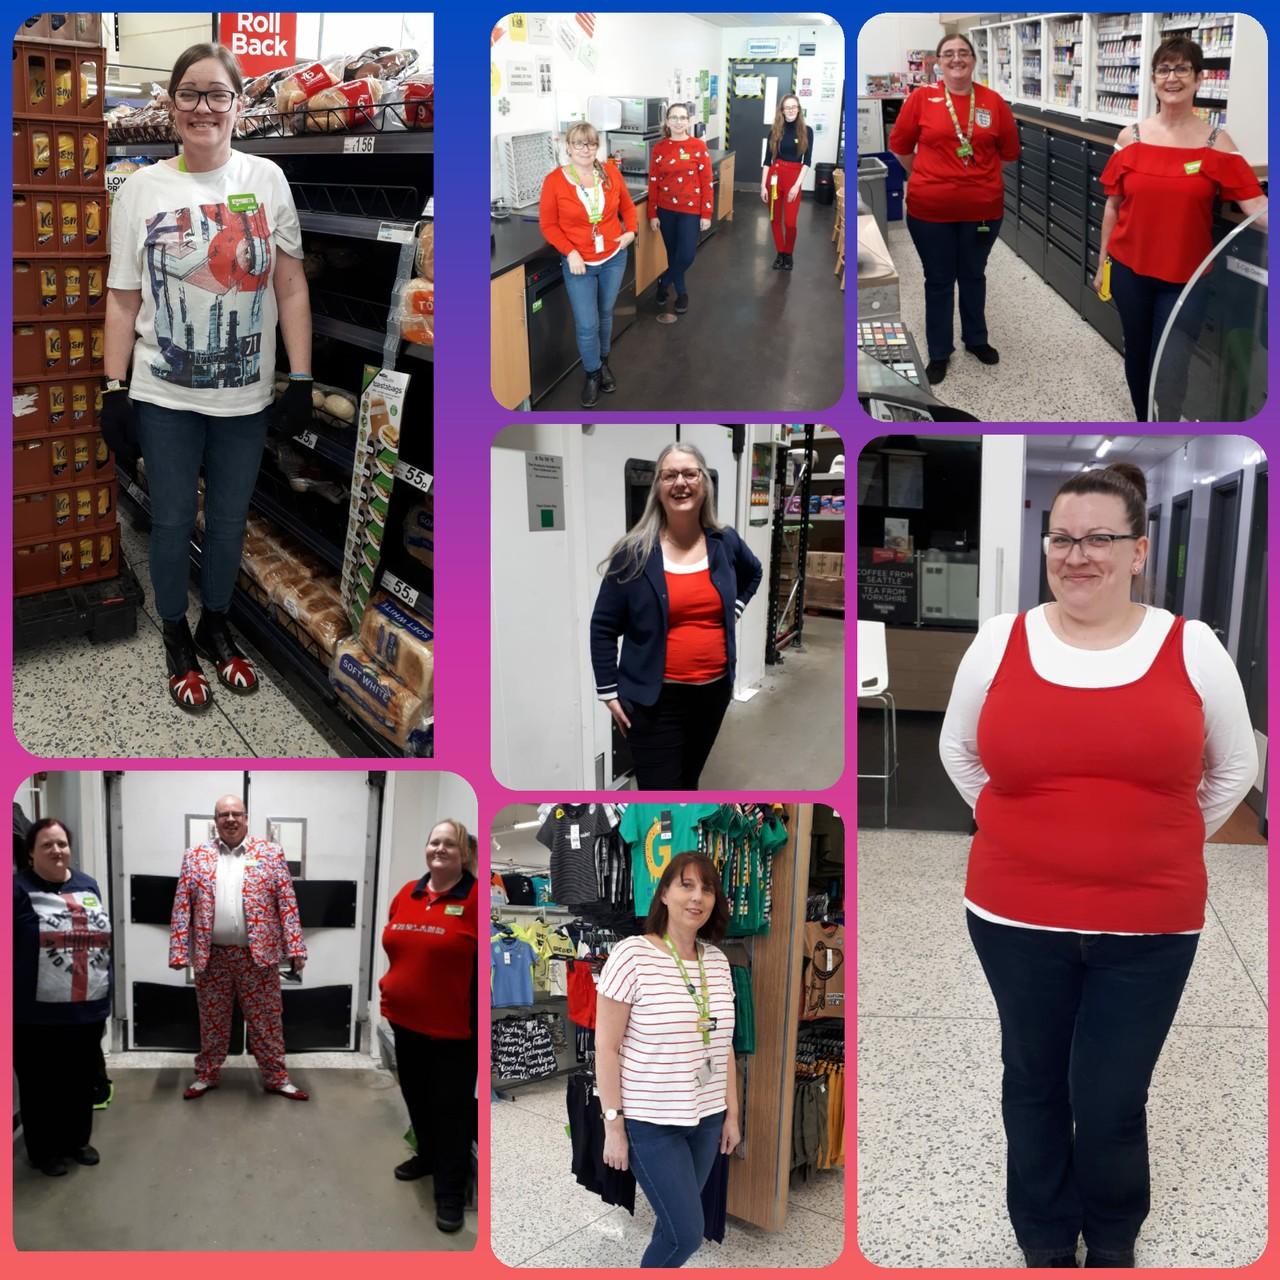 VE Day anniversary | Asda Gillingham Pier